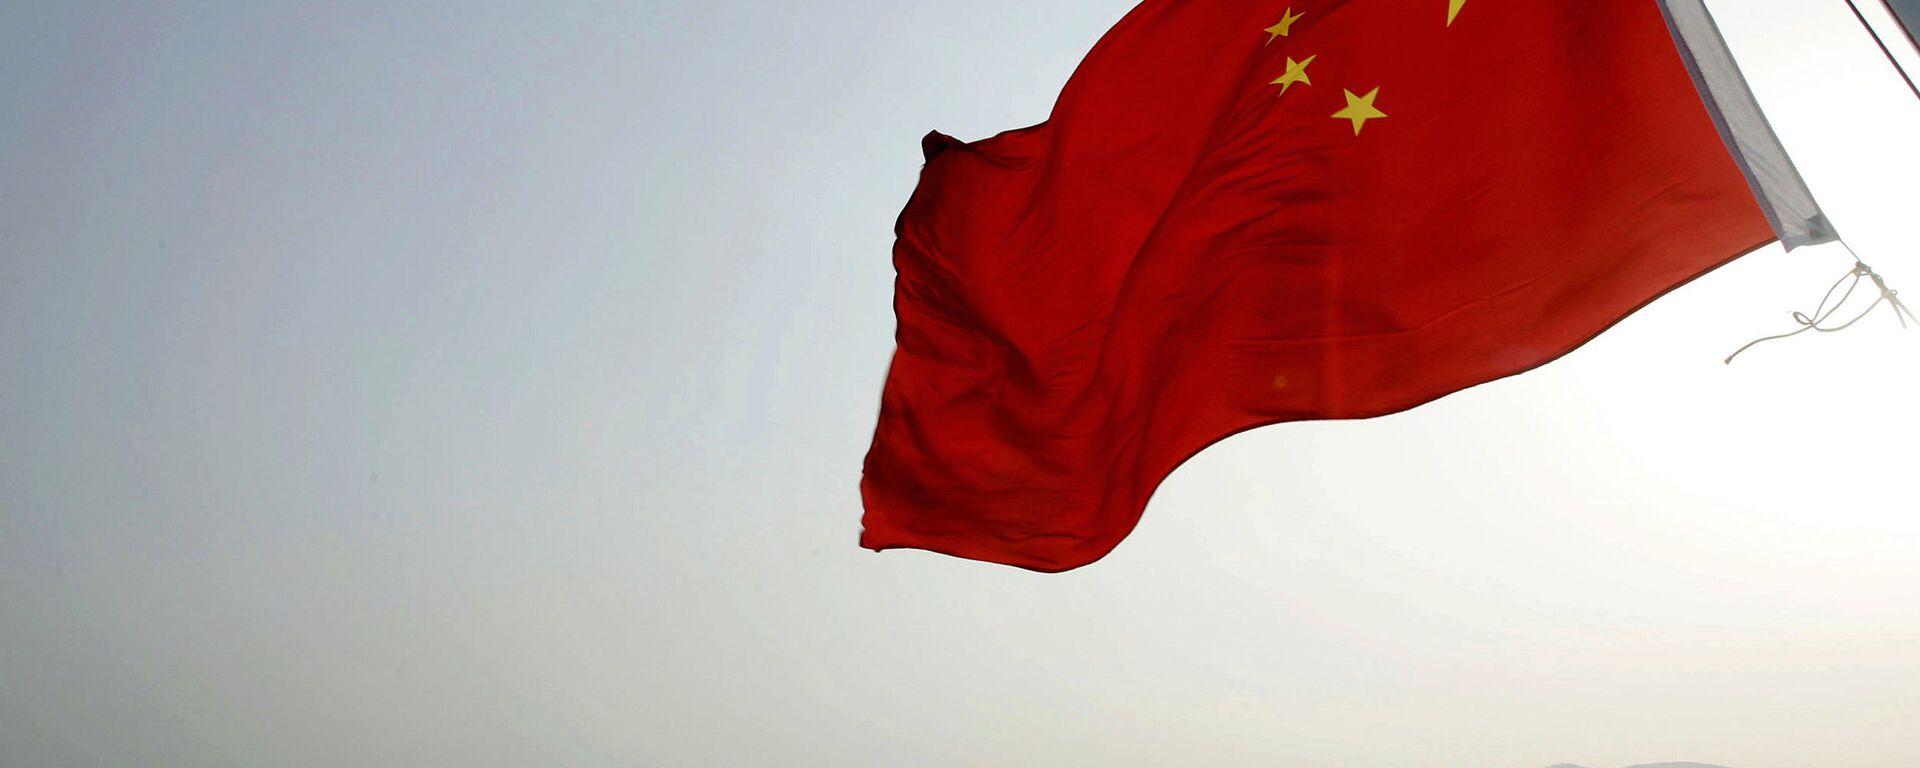 La bandiera cinese - Sputnik Italia, 1920, 11.10.2020